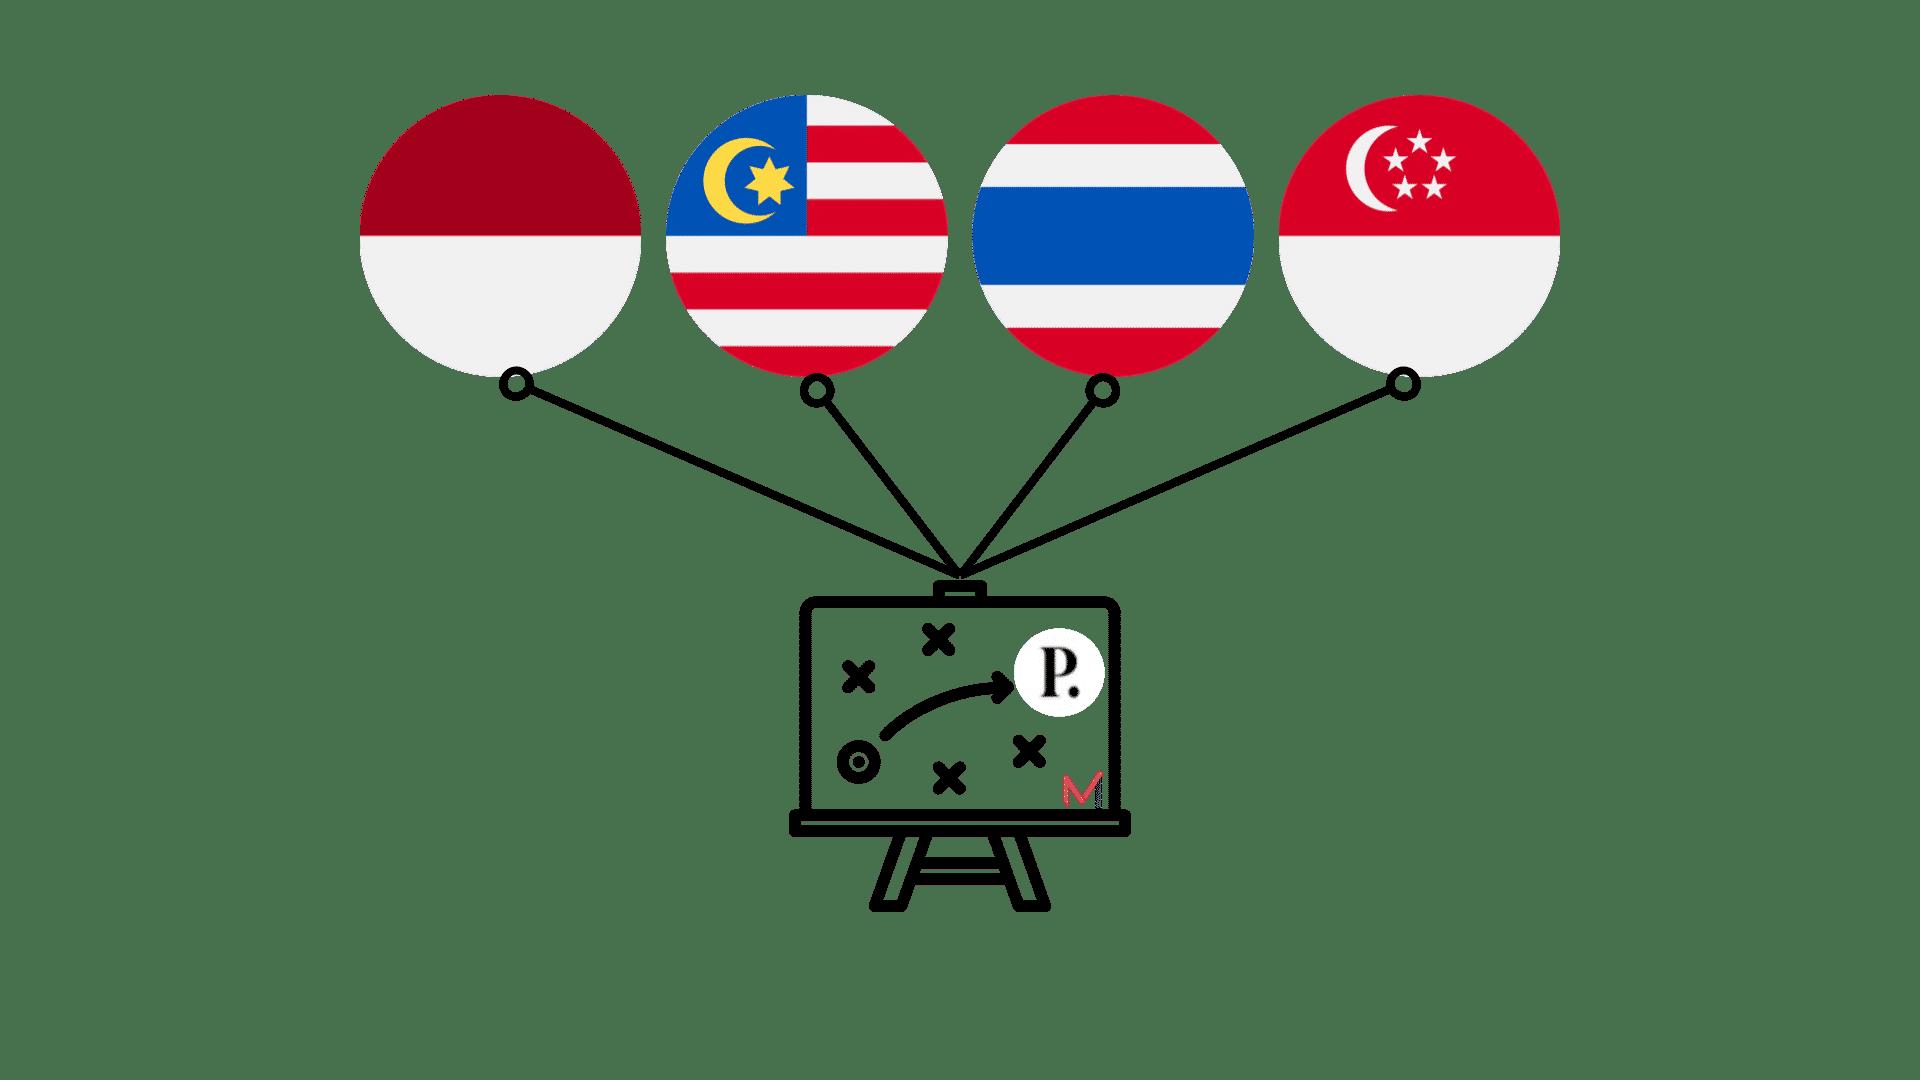 Pomelo countries